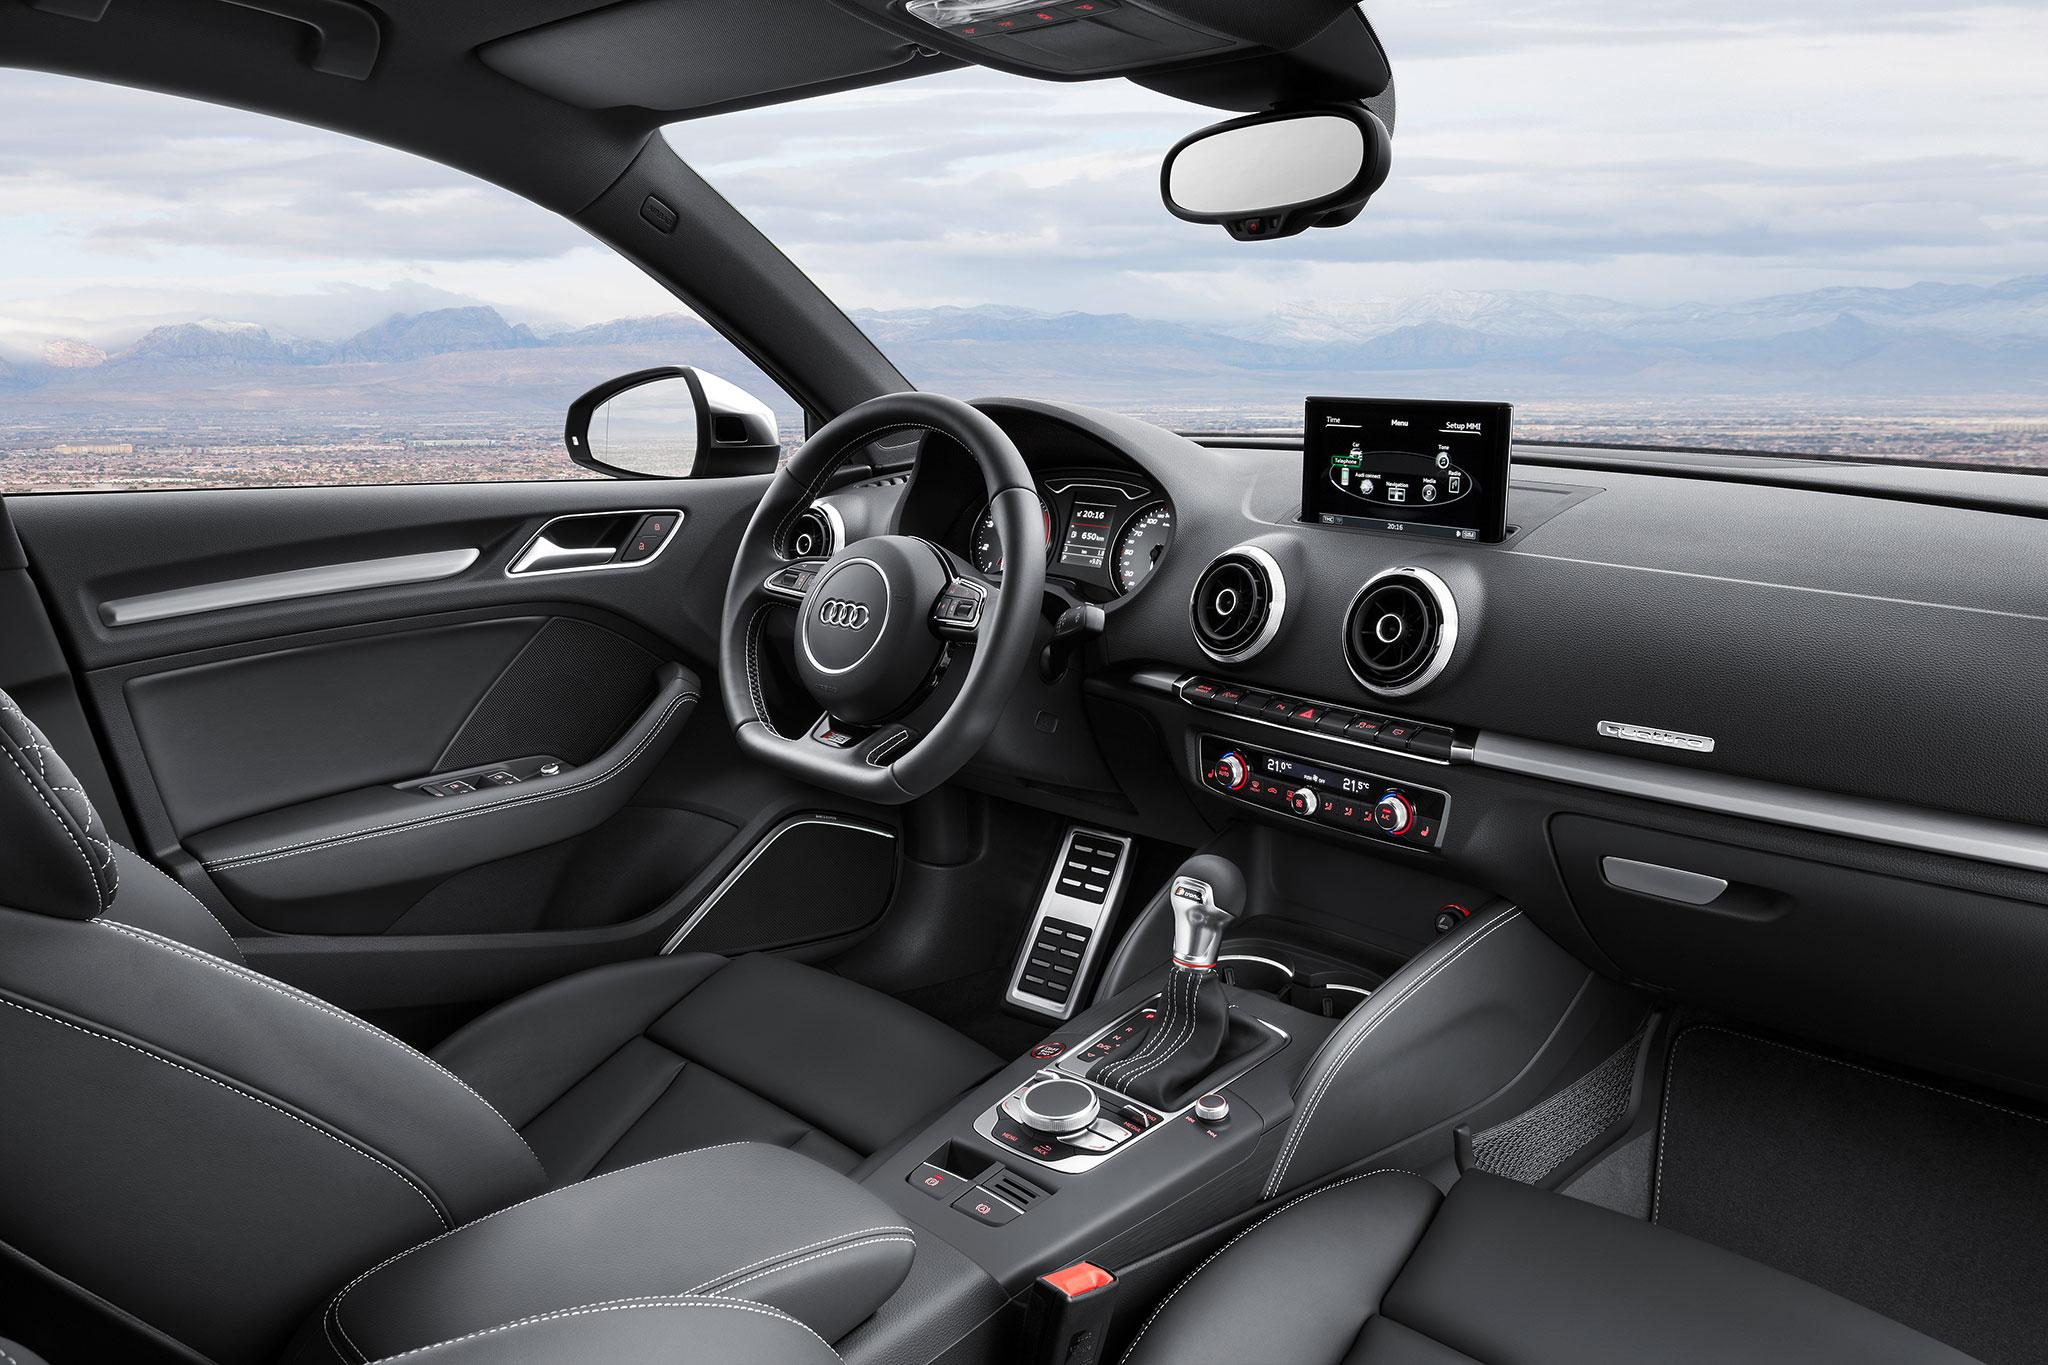 Benz cla class cla 250 edition 1 interior 1920x1080 59 of 183 - 51 250